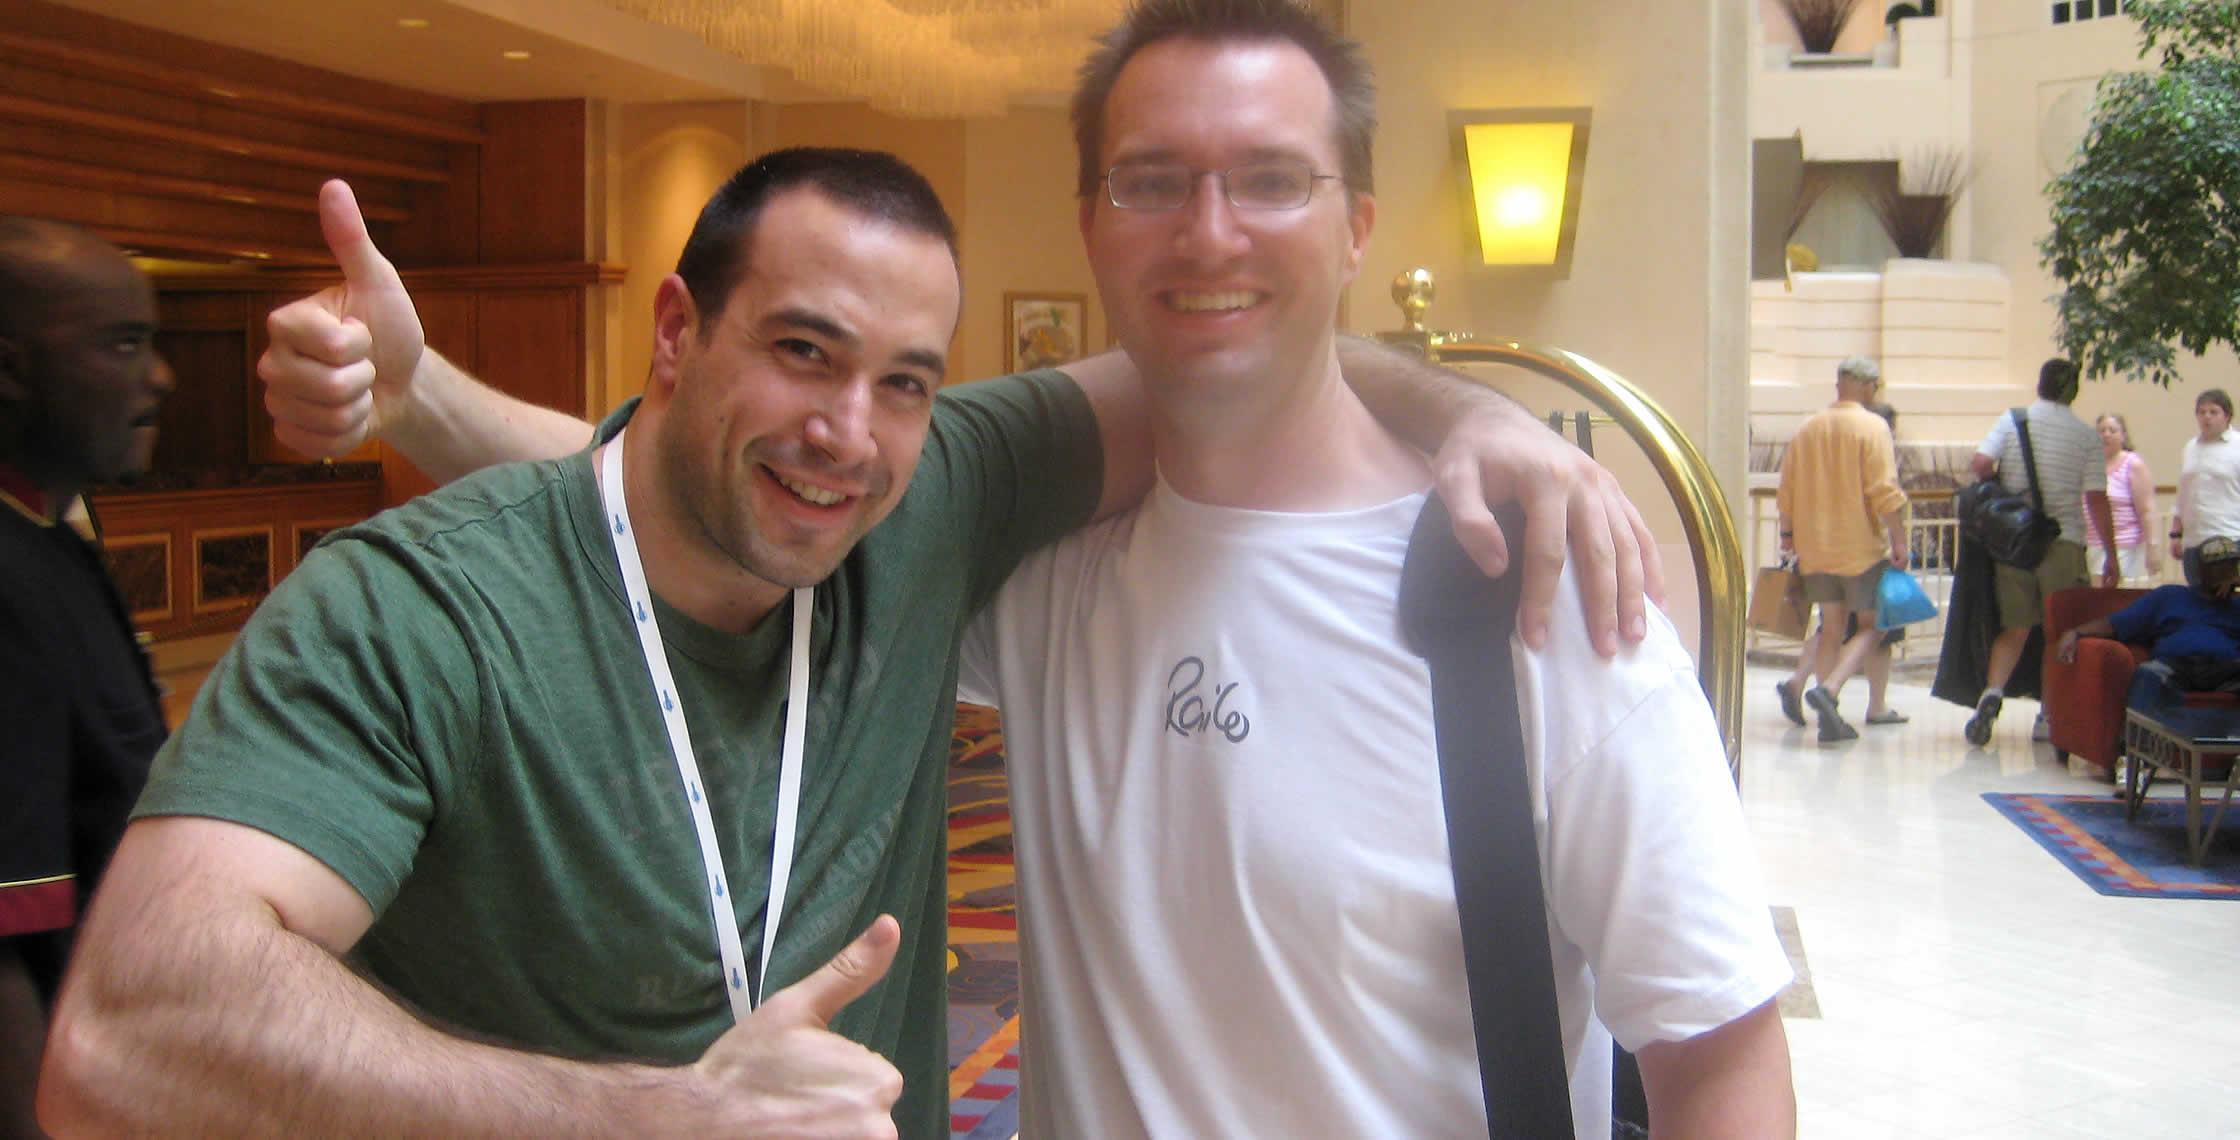 Ben Nadel at CFUNITED 2008 (Washington, D.C.) with: Joe Rinehart